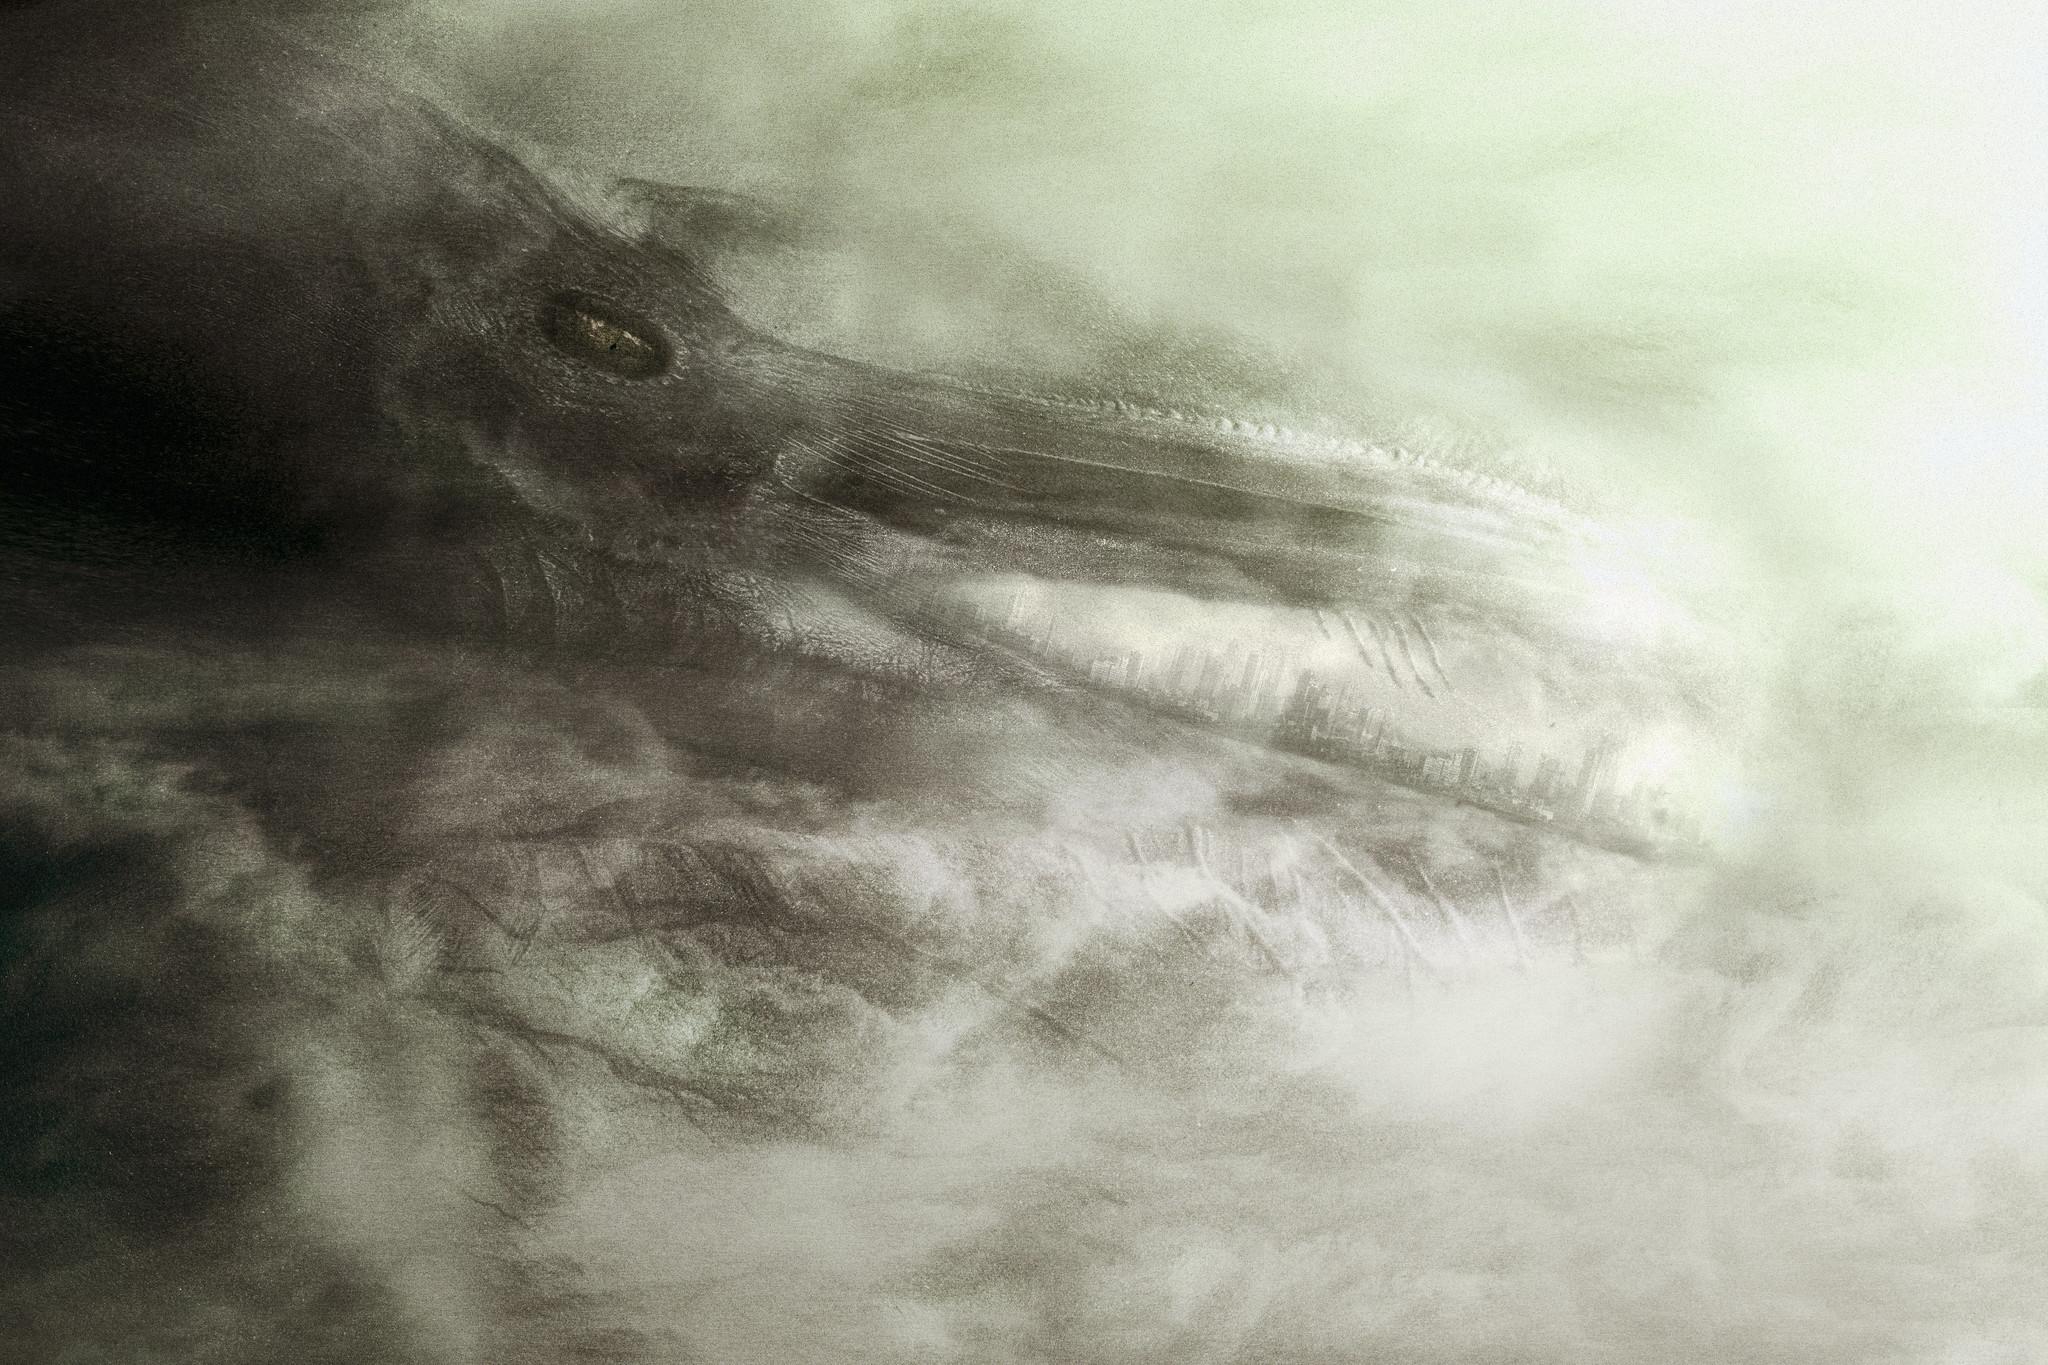 Corvus-19